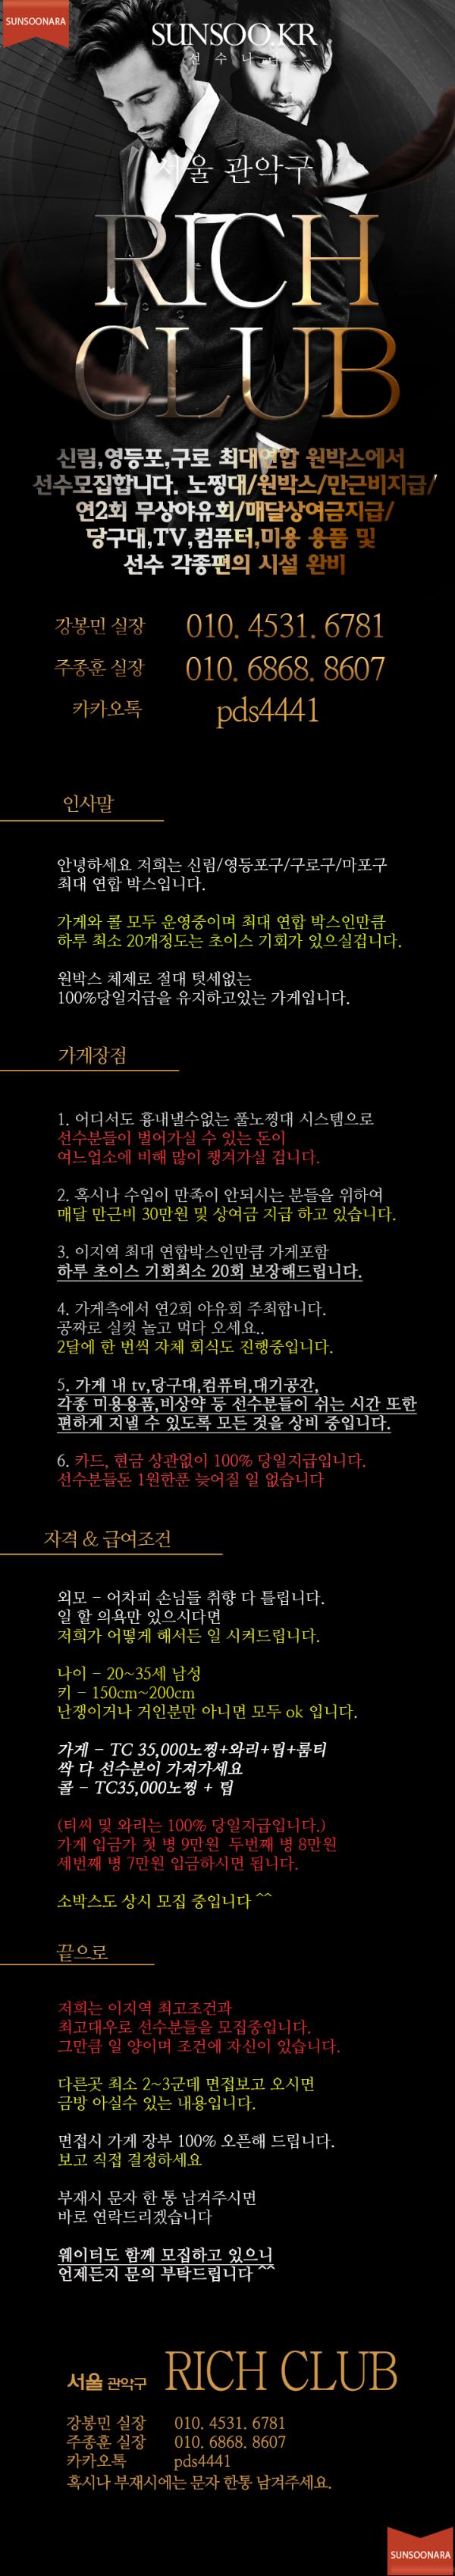 RICH CLUB 박선우.png